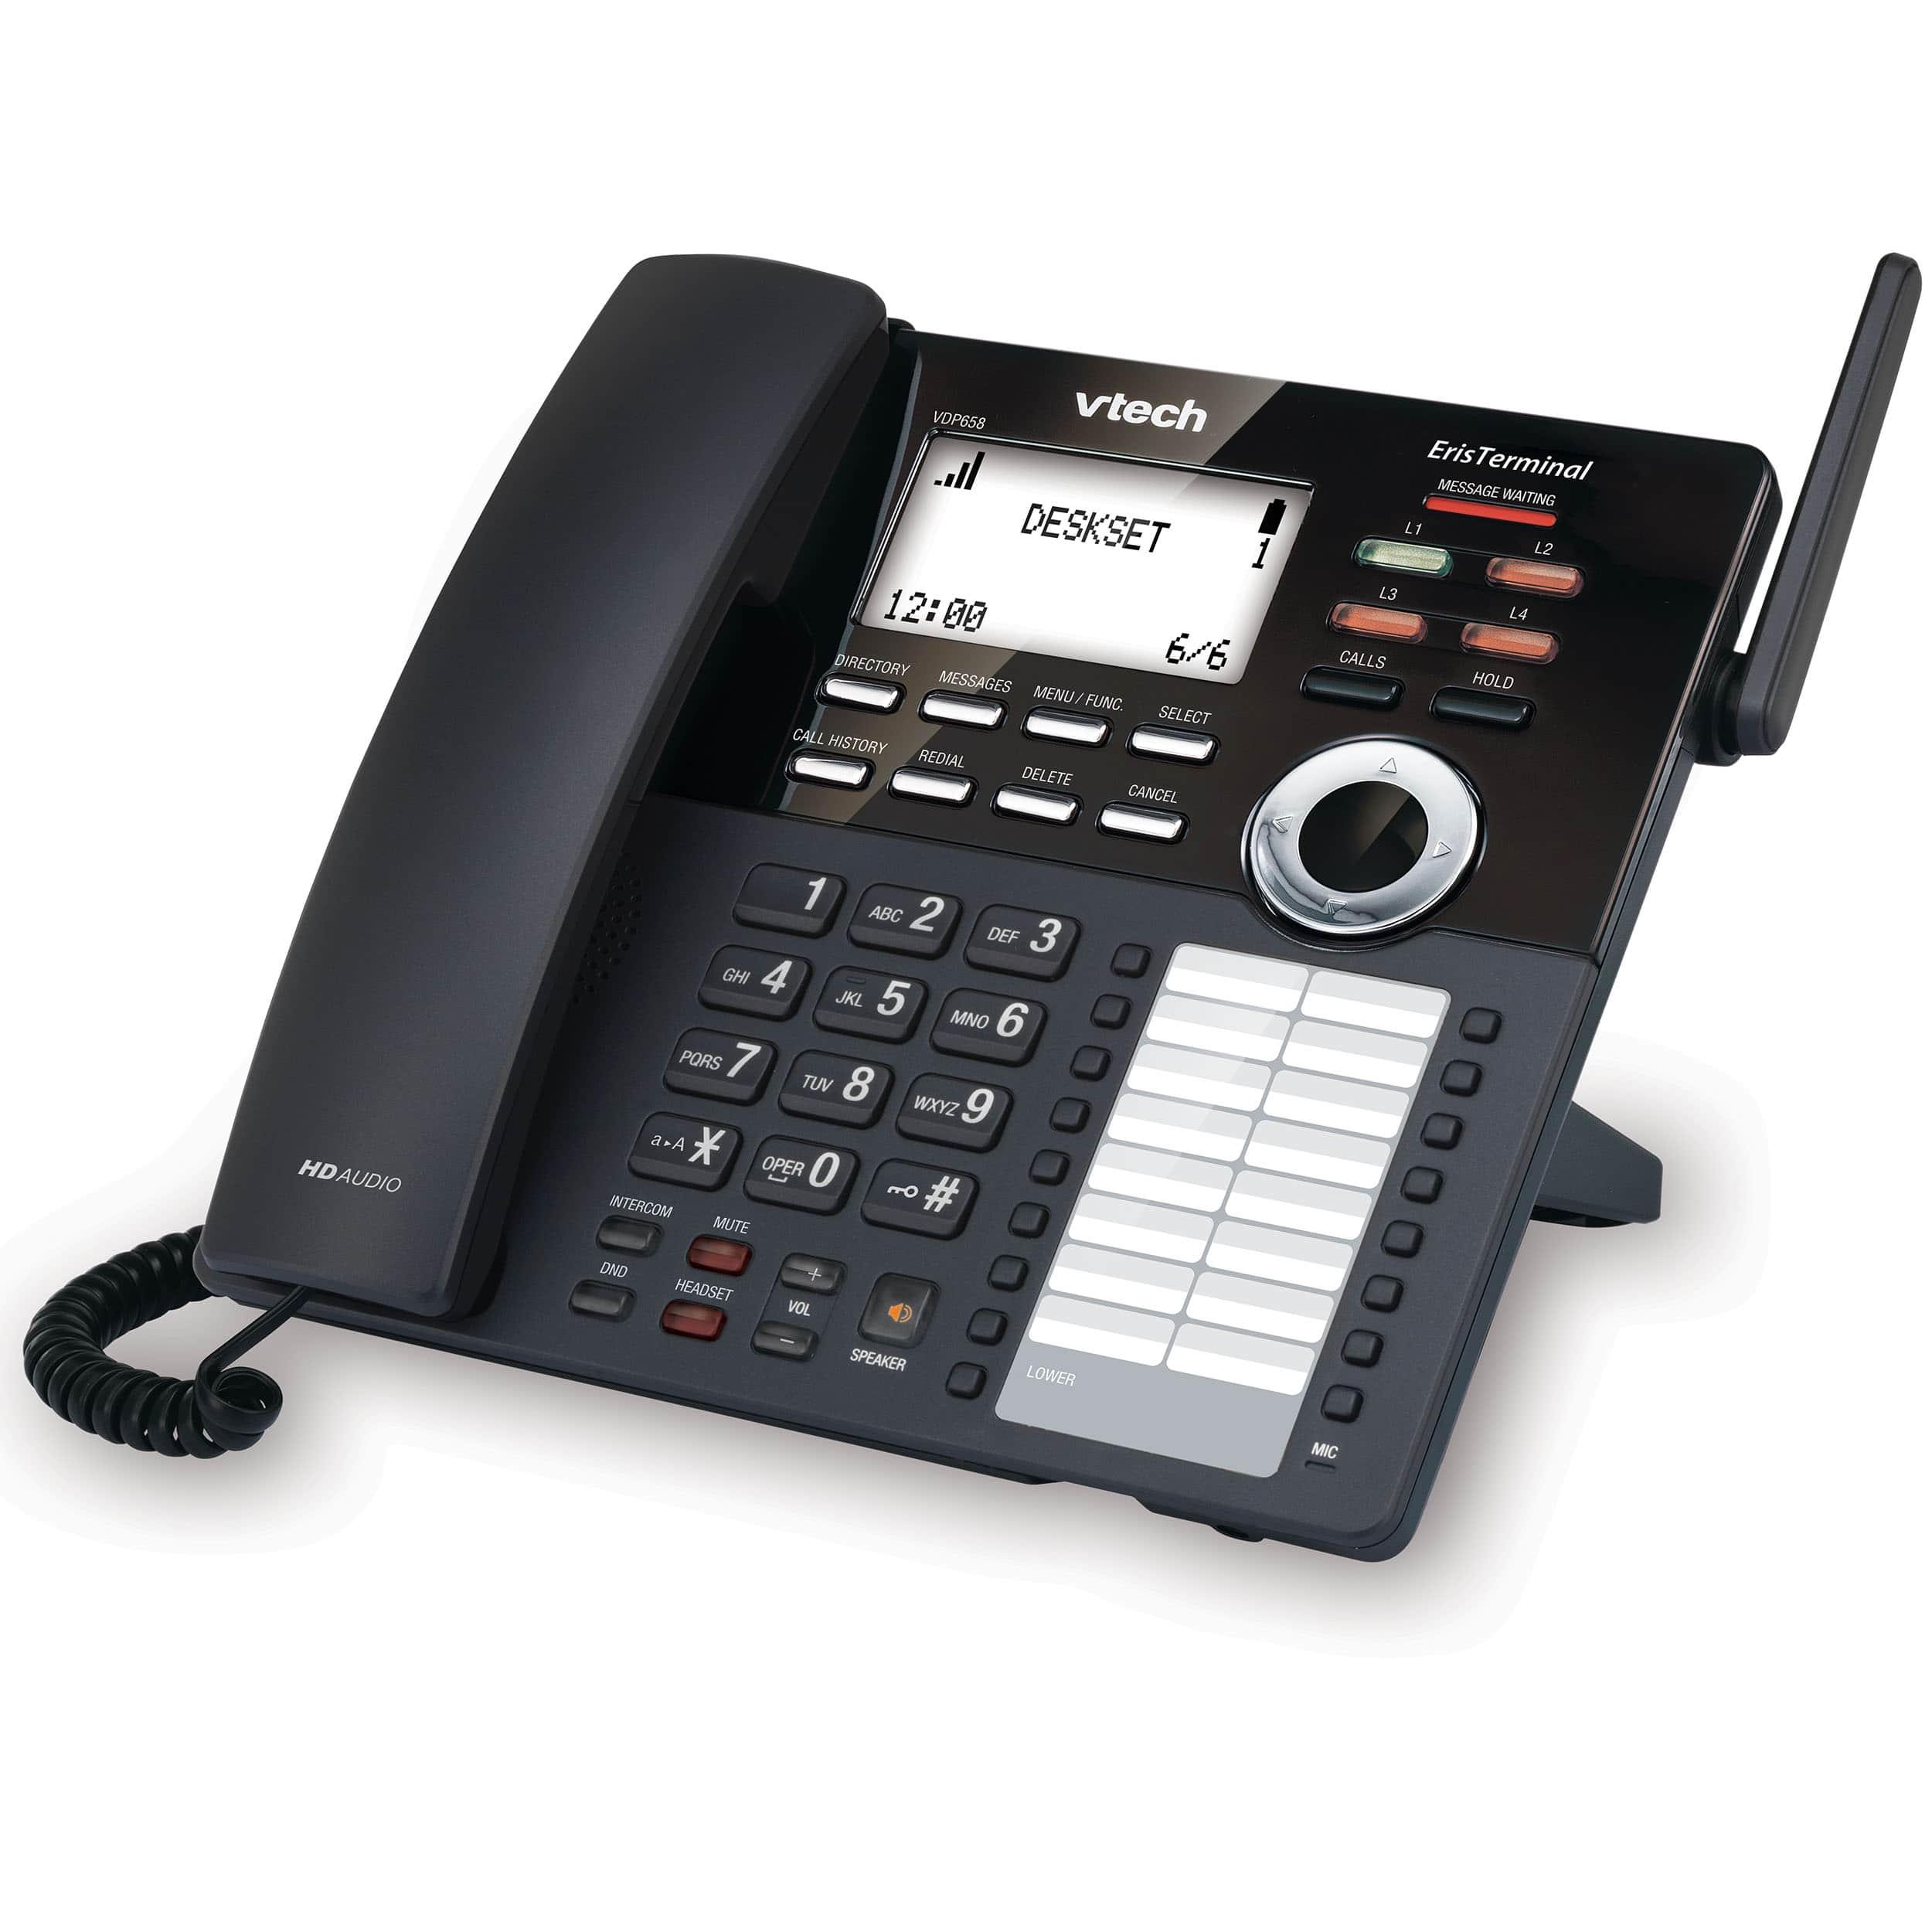 Eristerminal Sip Dect Cordless 4 Line Deskset Vtech Business Phones Wireless Intercom Ac Power Systems Up To 1000 Previous